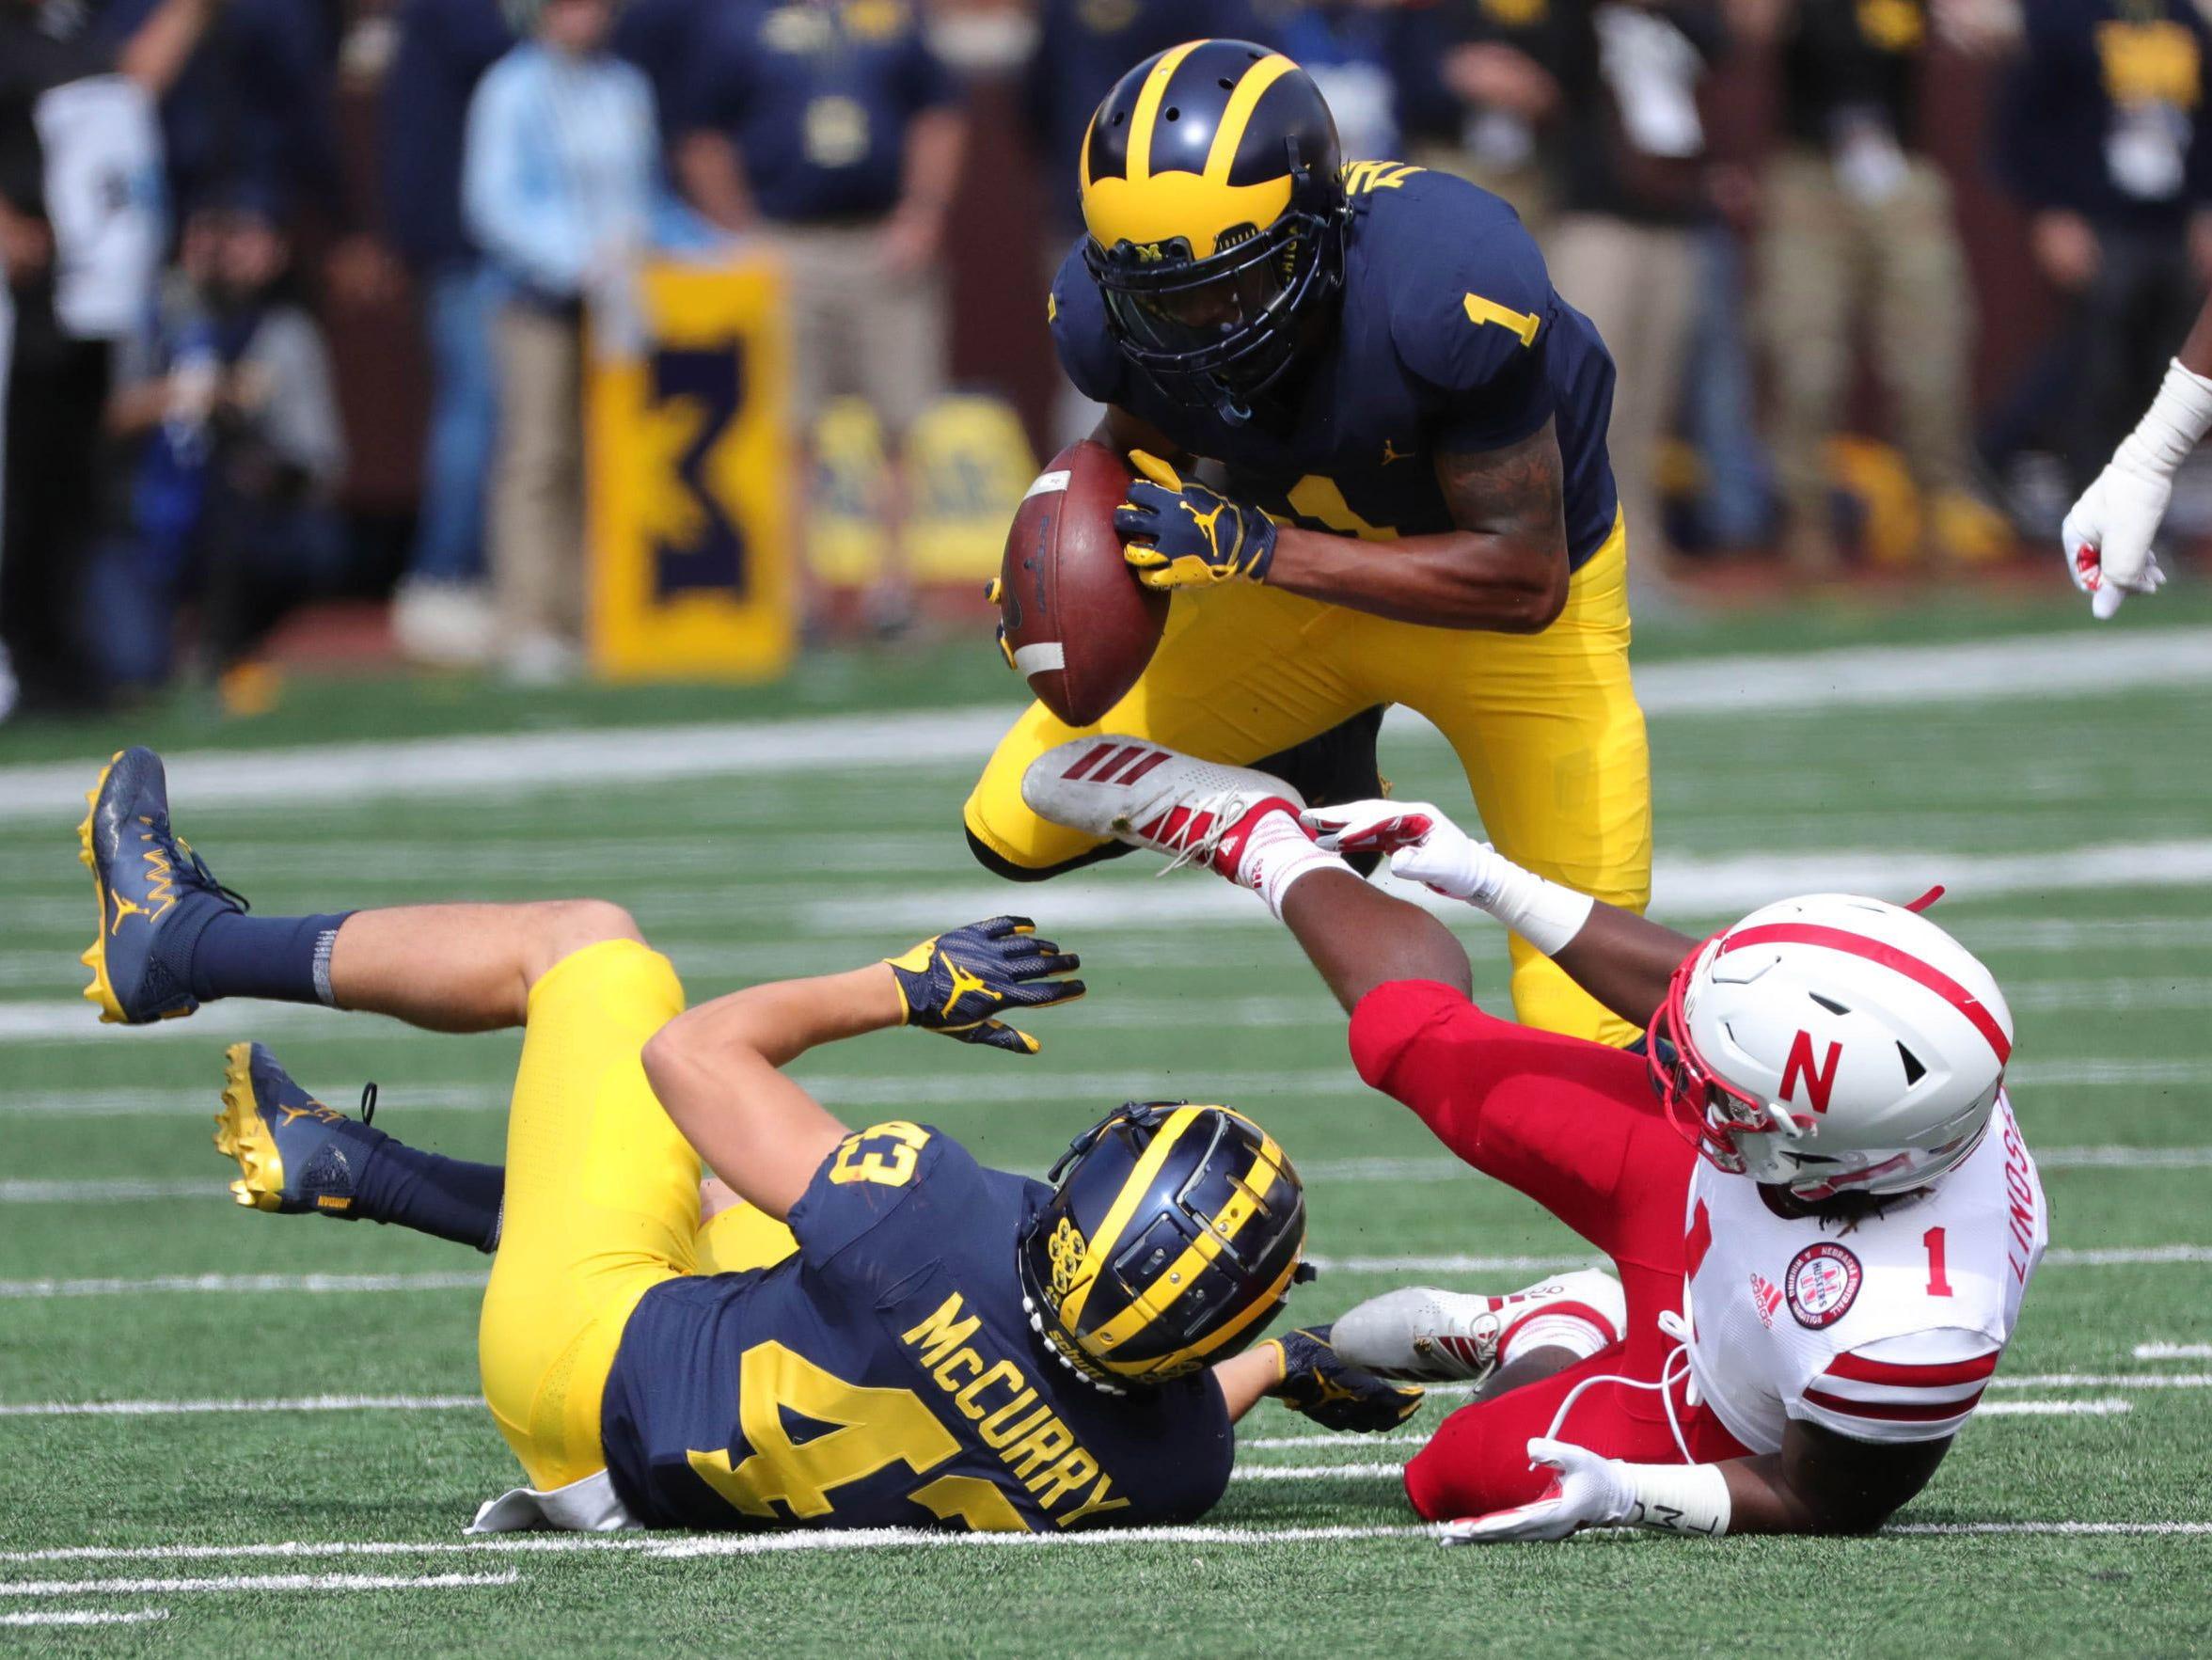 Michigan defensive back Ambry Thomas recovers a fumble by Nebraska receiver Tyjon Lindsey at Michigan Stadium.